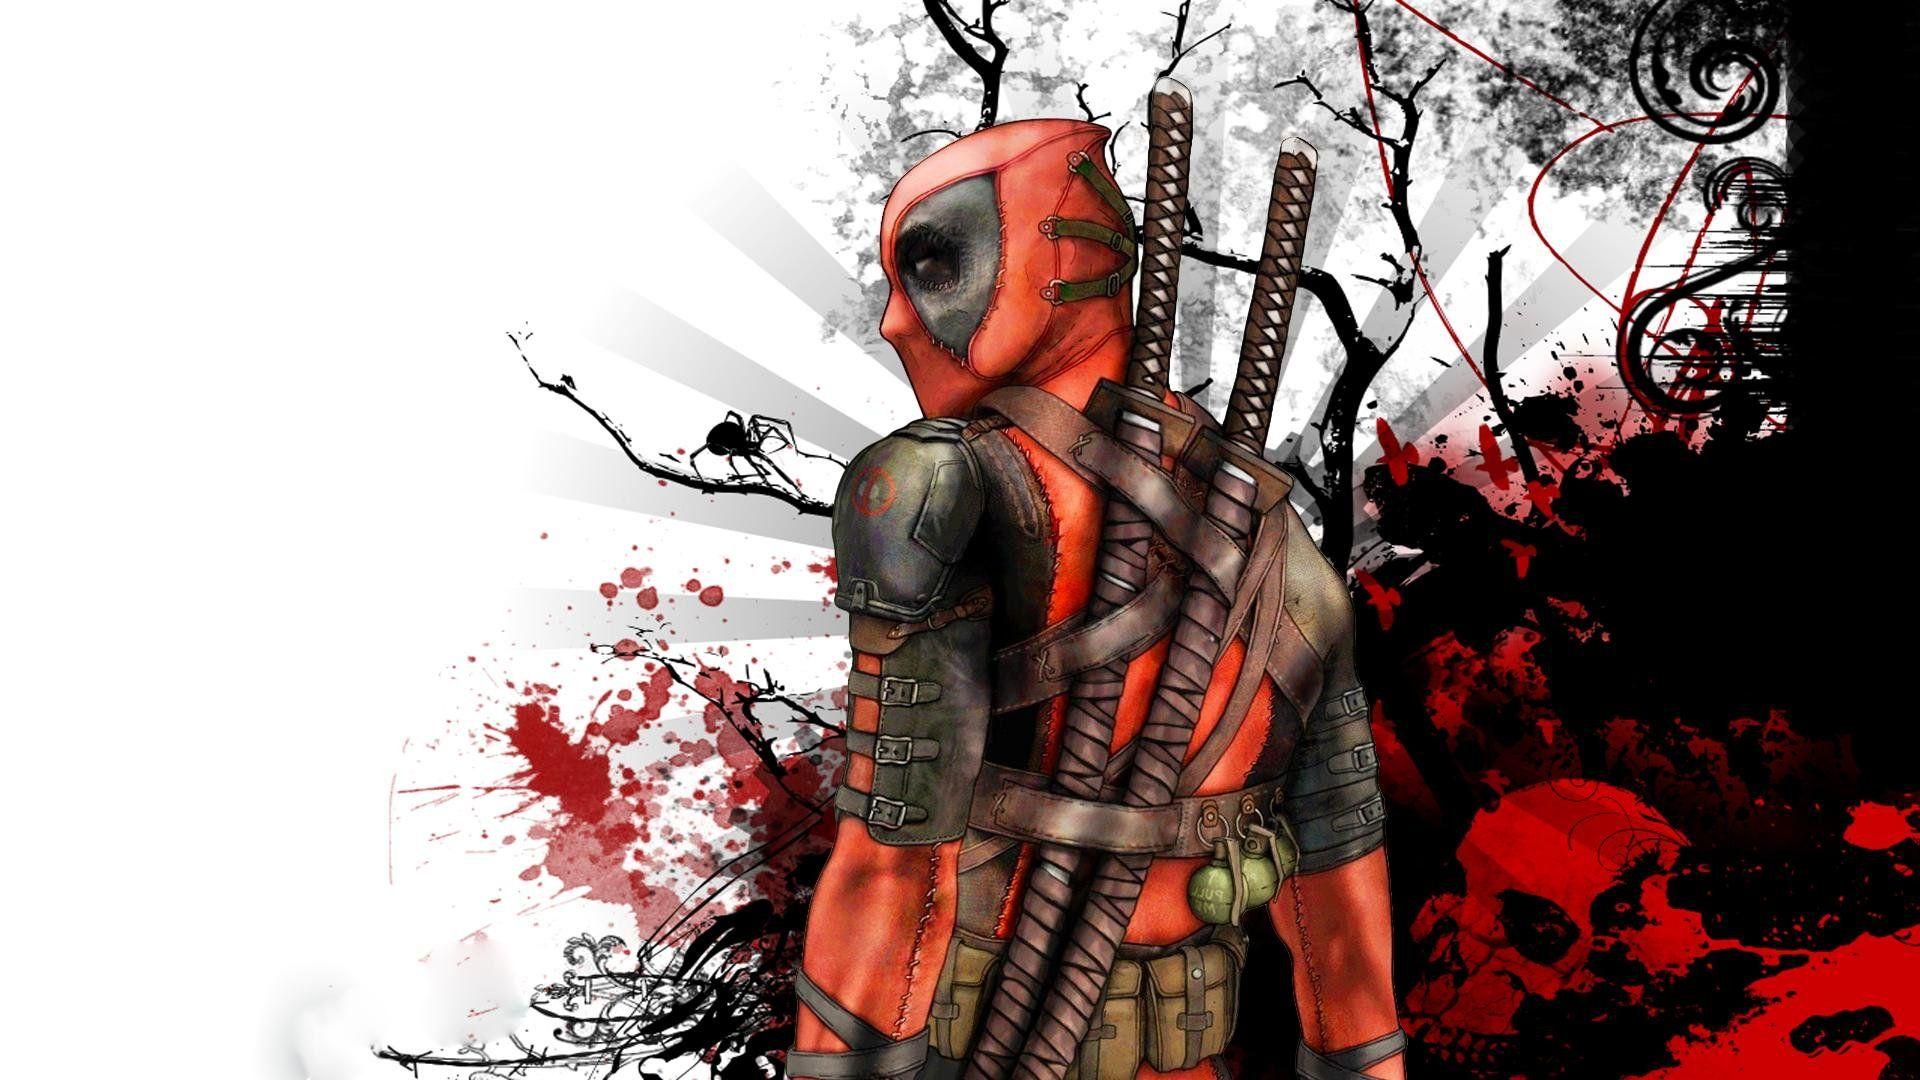 1000 Ideas About Deadpool Hd Wallpaper On Pinterest: Deadpool HD Wallpapers Backgrounds Wallpaper